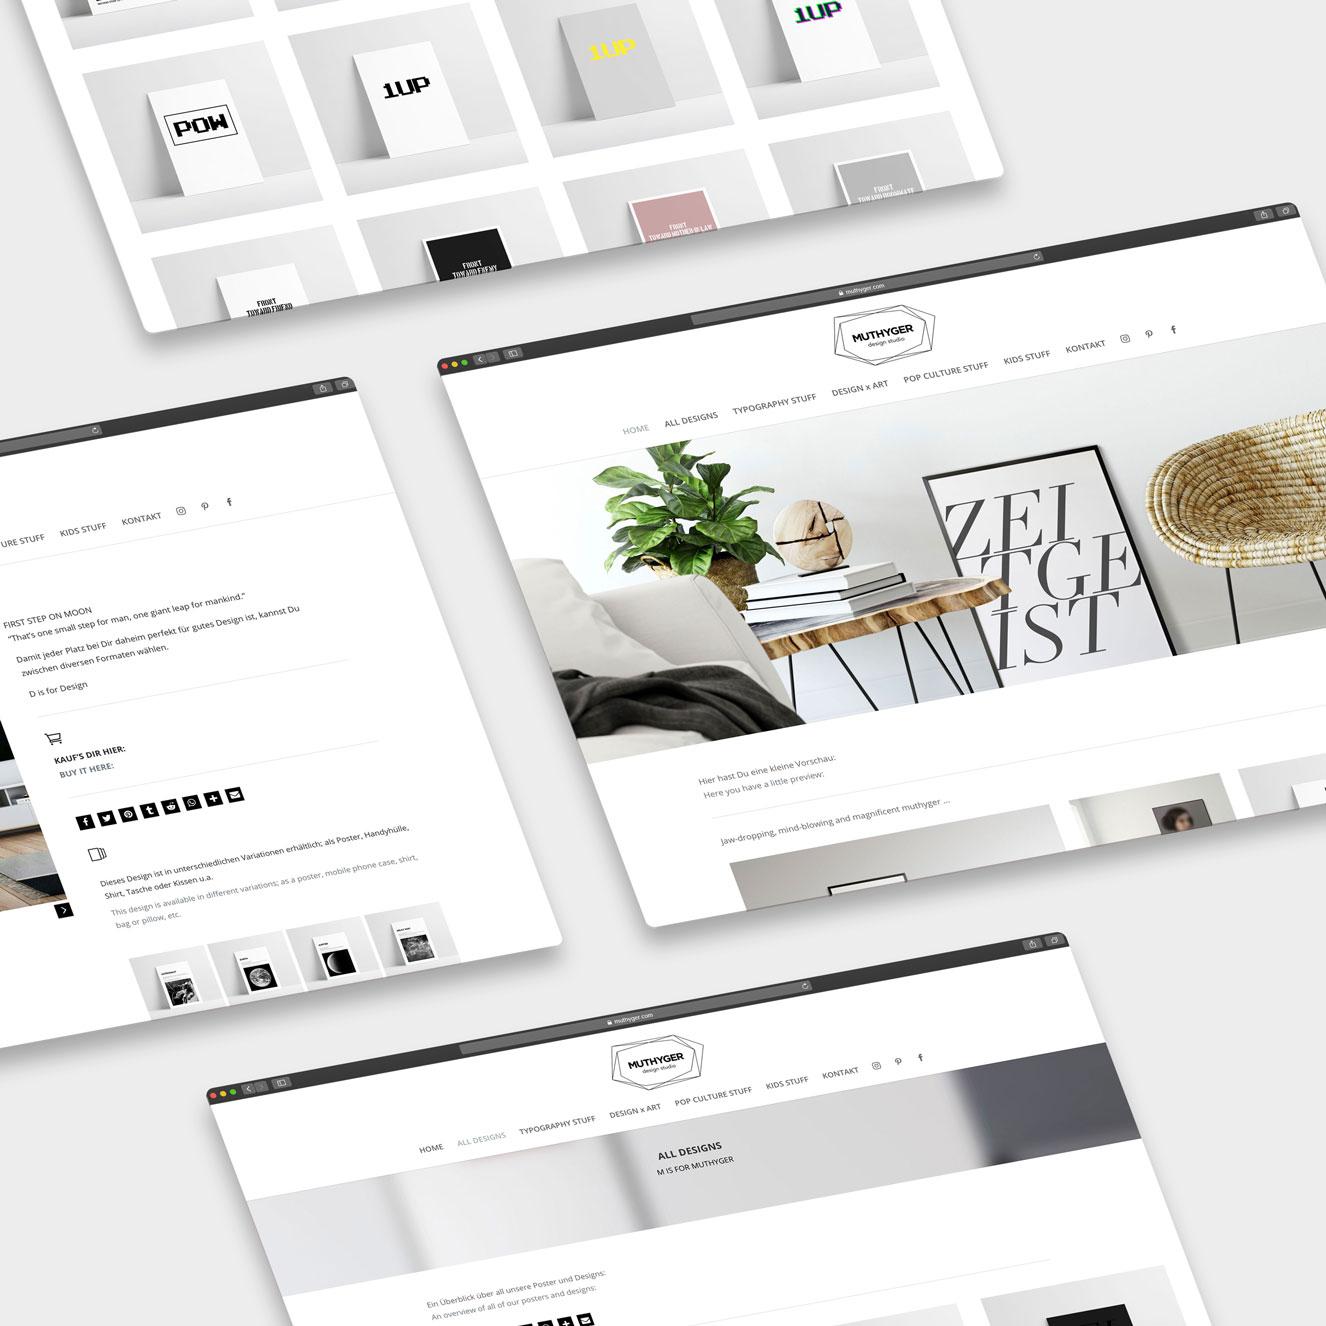 1313 multimedial Grafikdesign Webdesign Sauerland Arnsberg muthyger